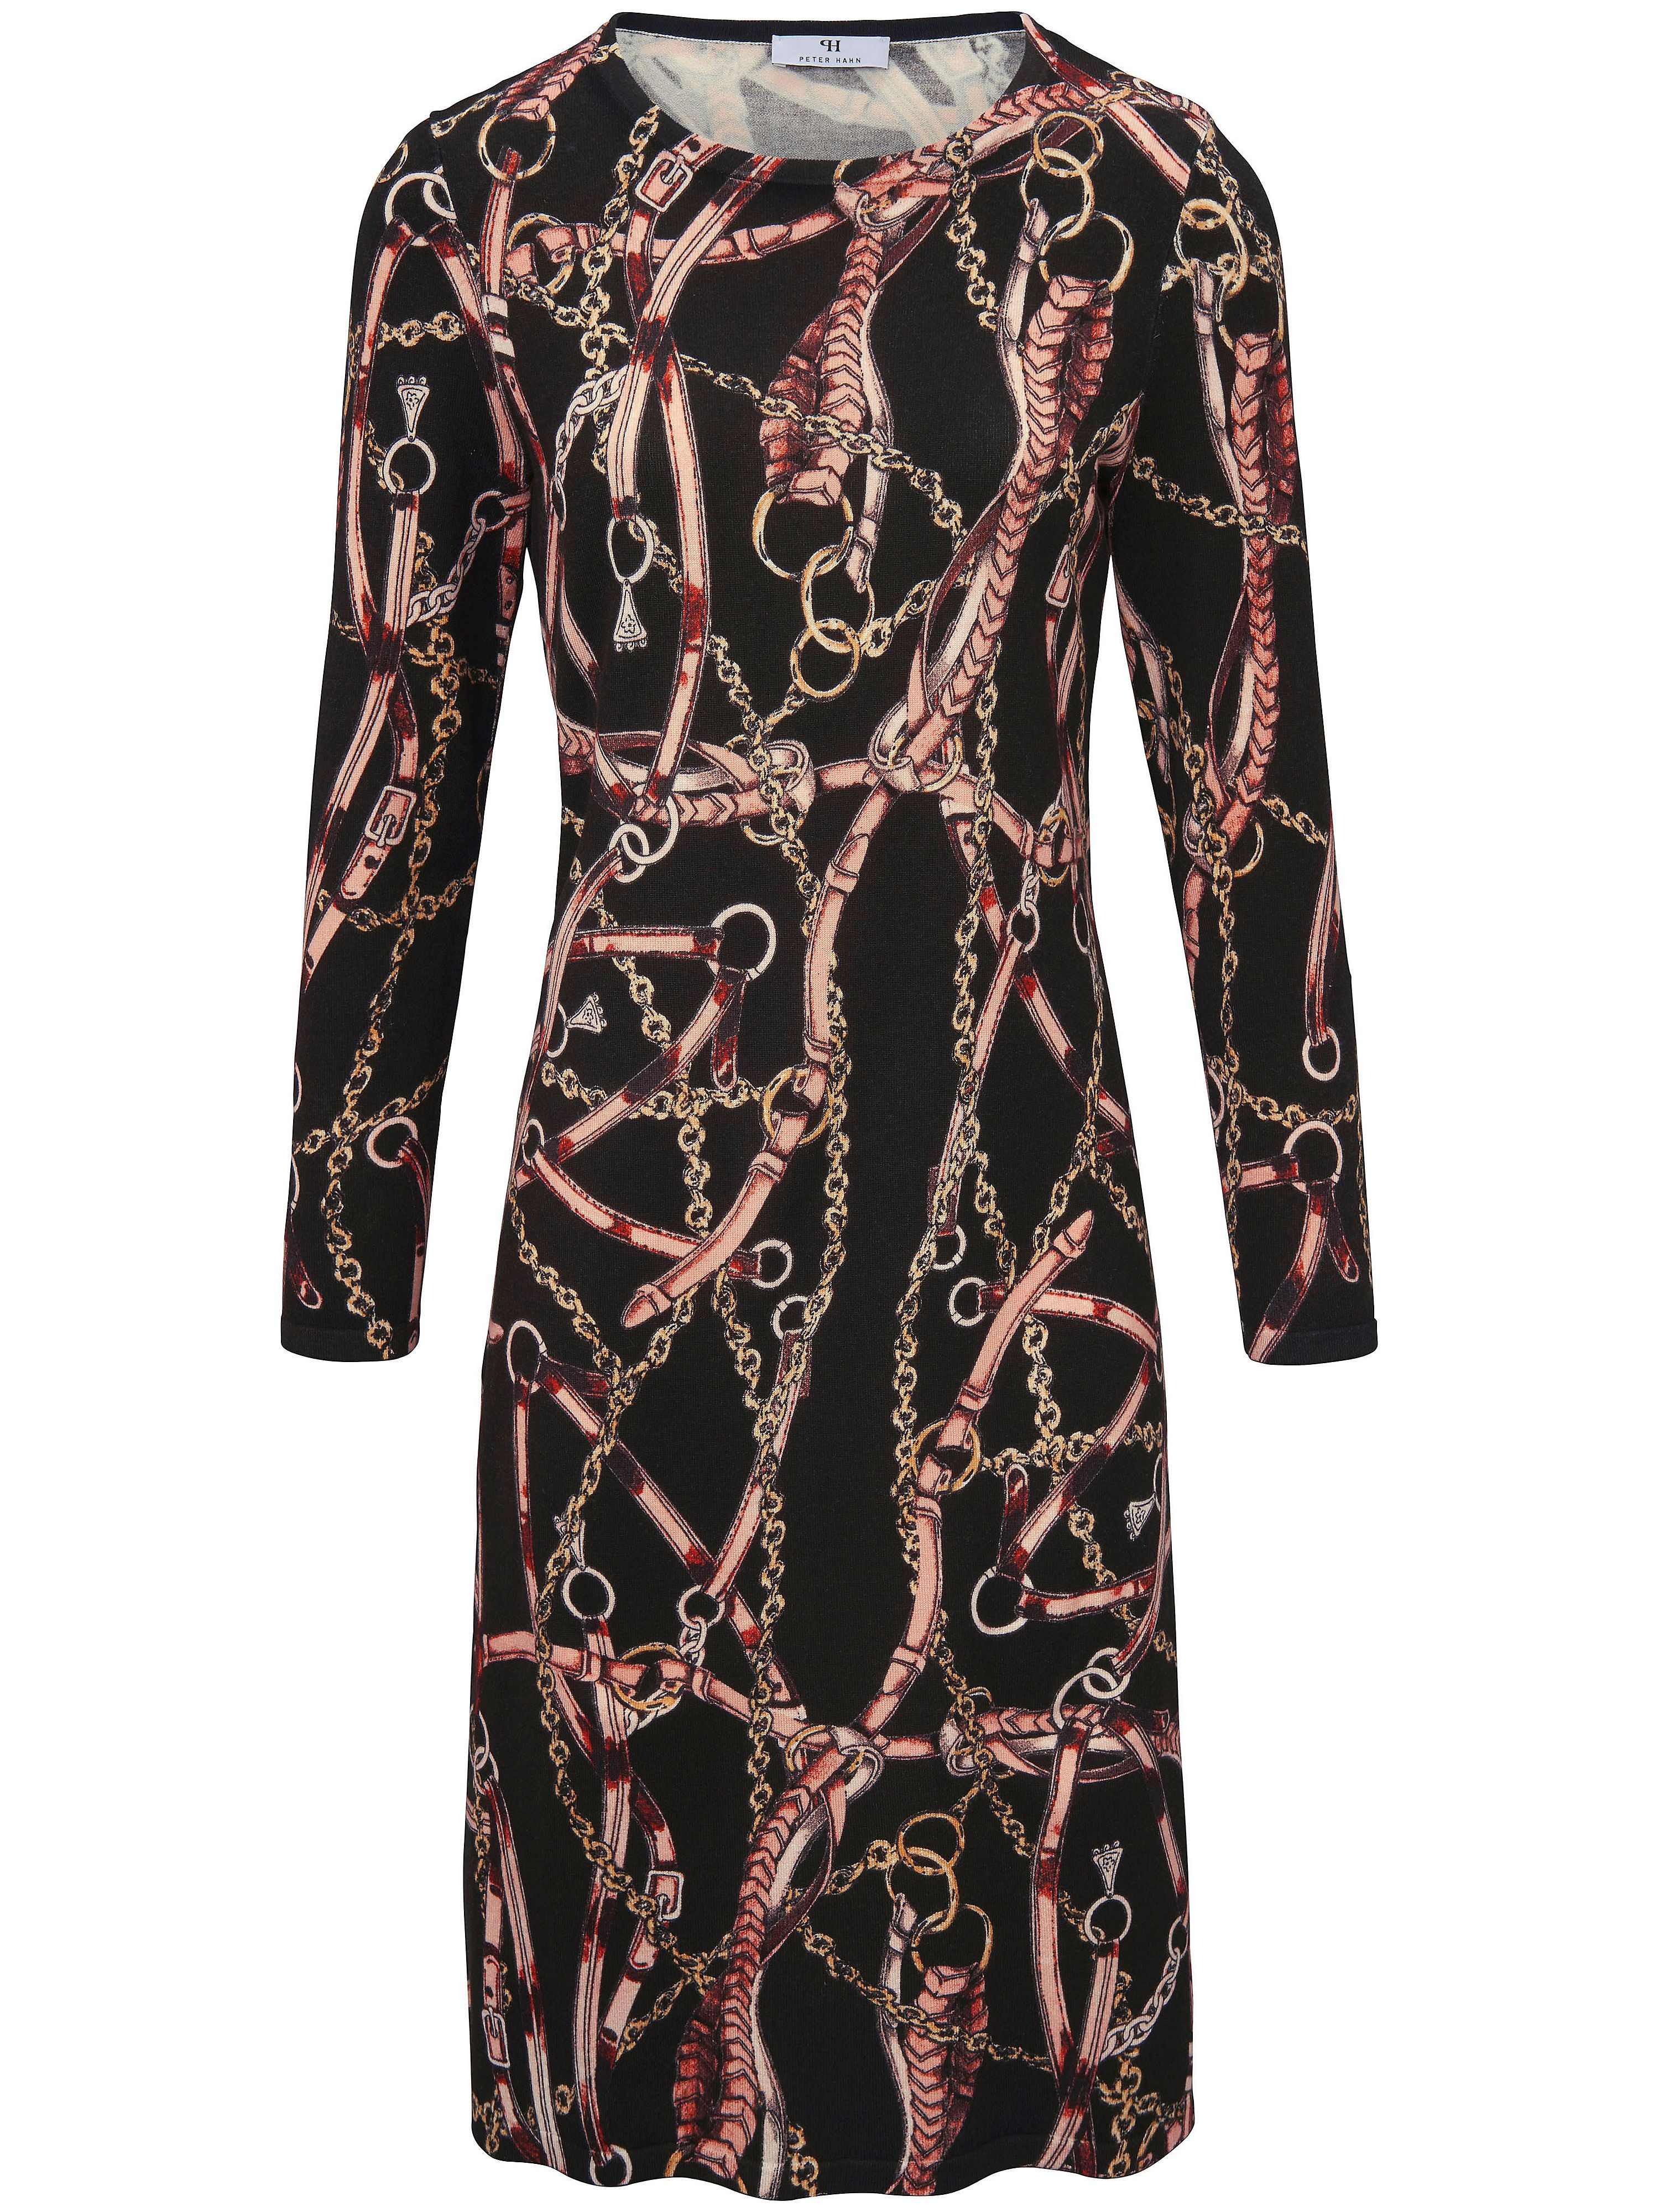 Robe Mode In 2018 Et 40 Peter Hahn La Taille Vetements Multicolore 4pxdOdnq